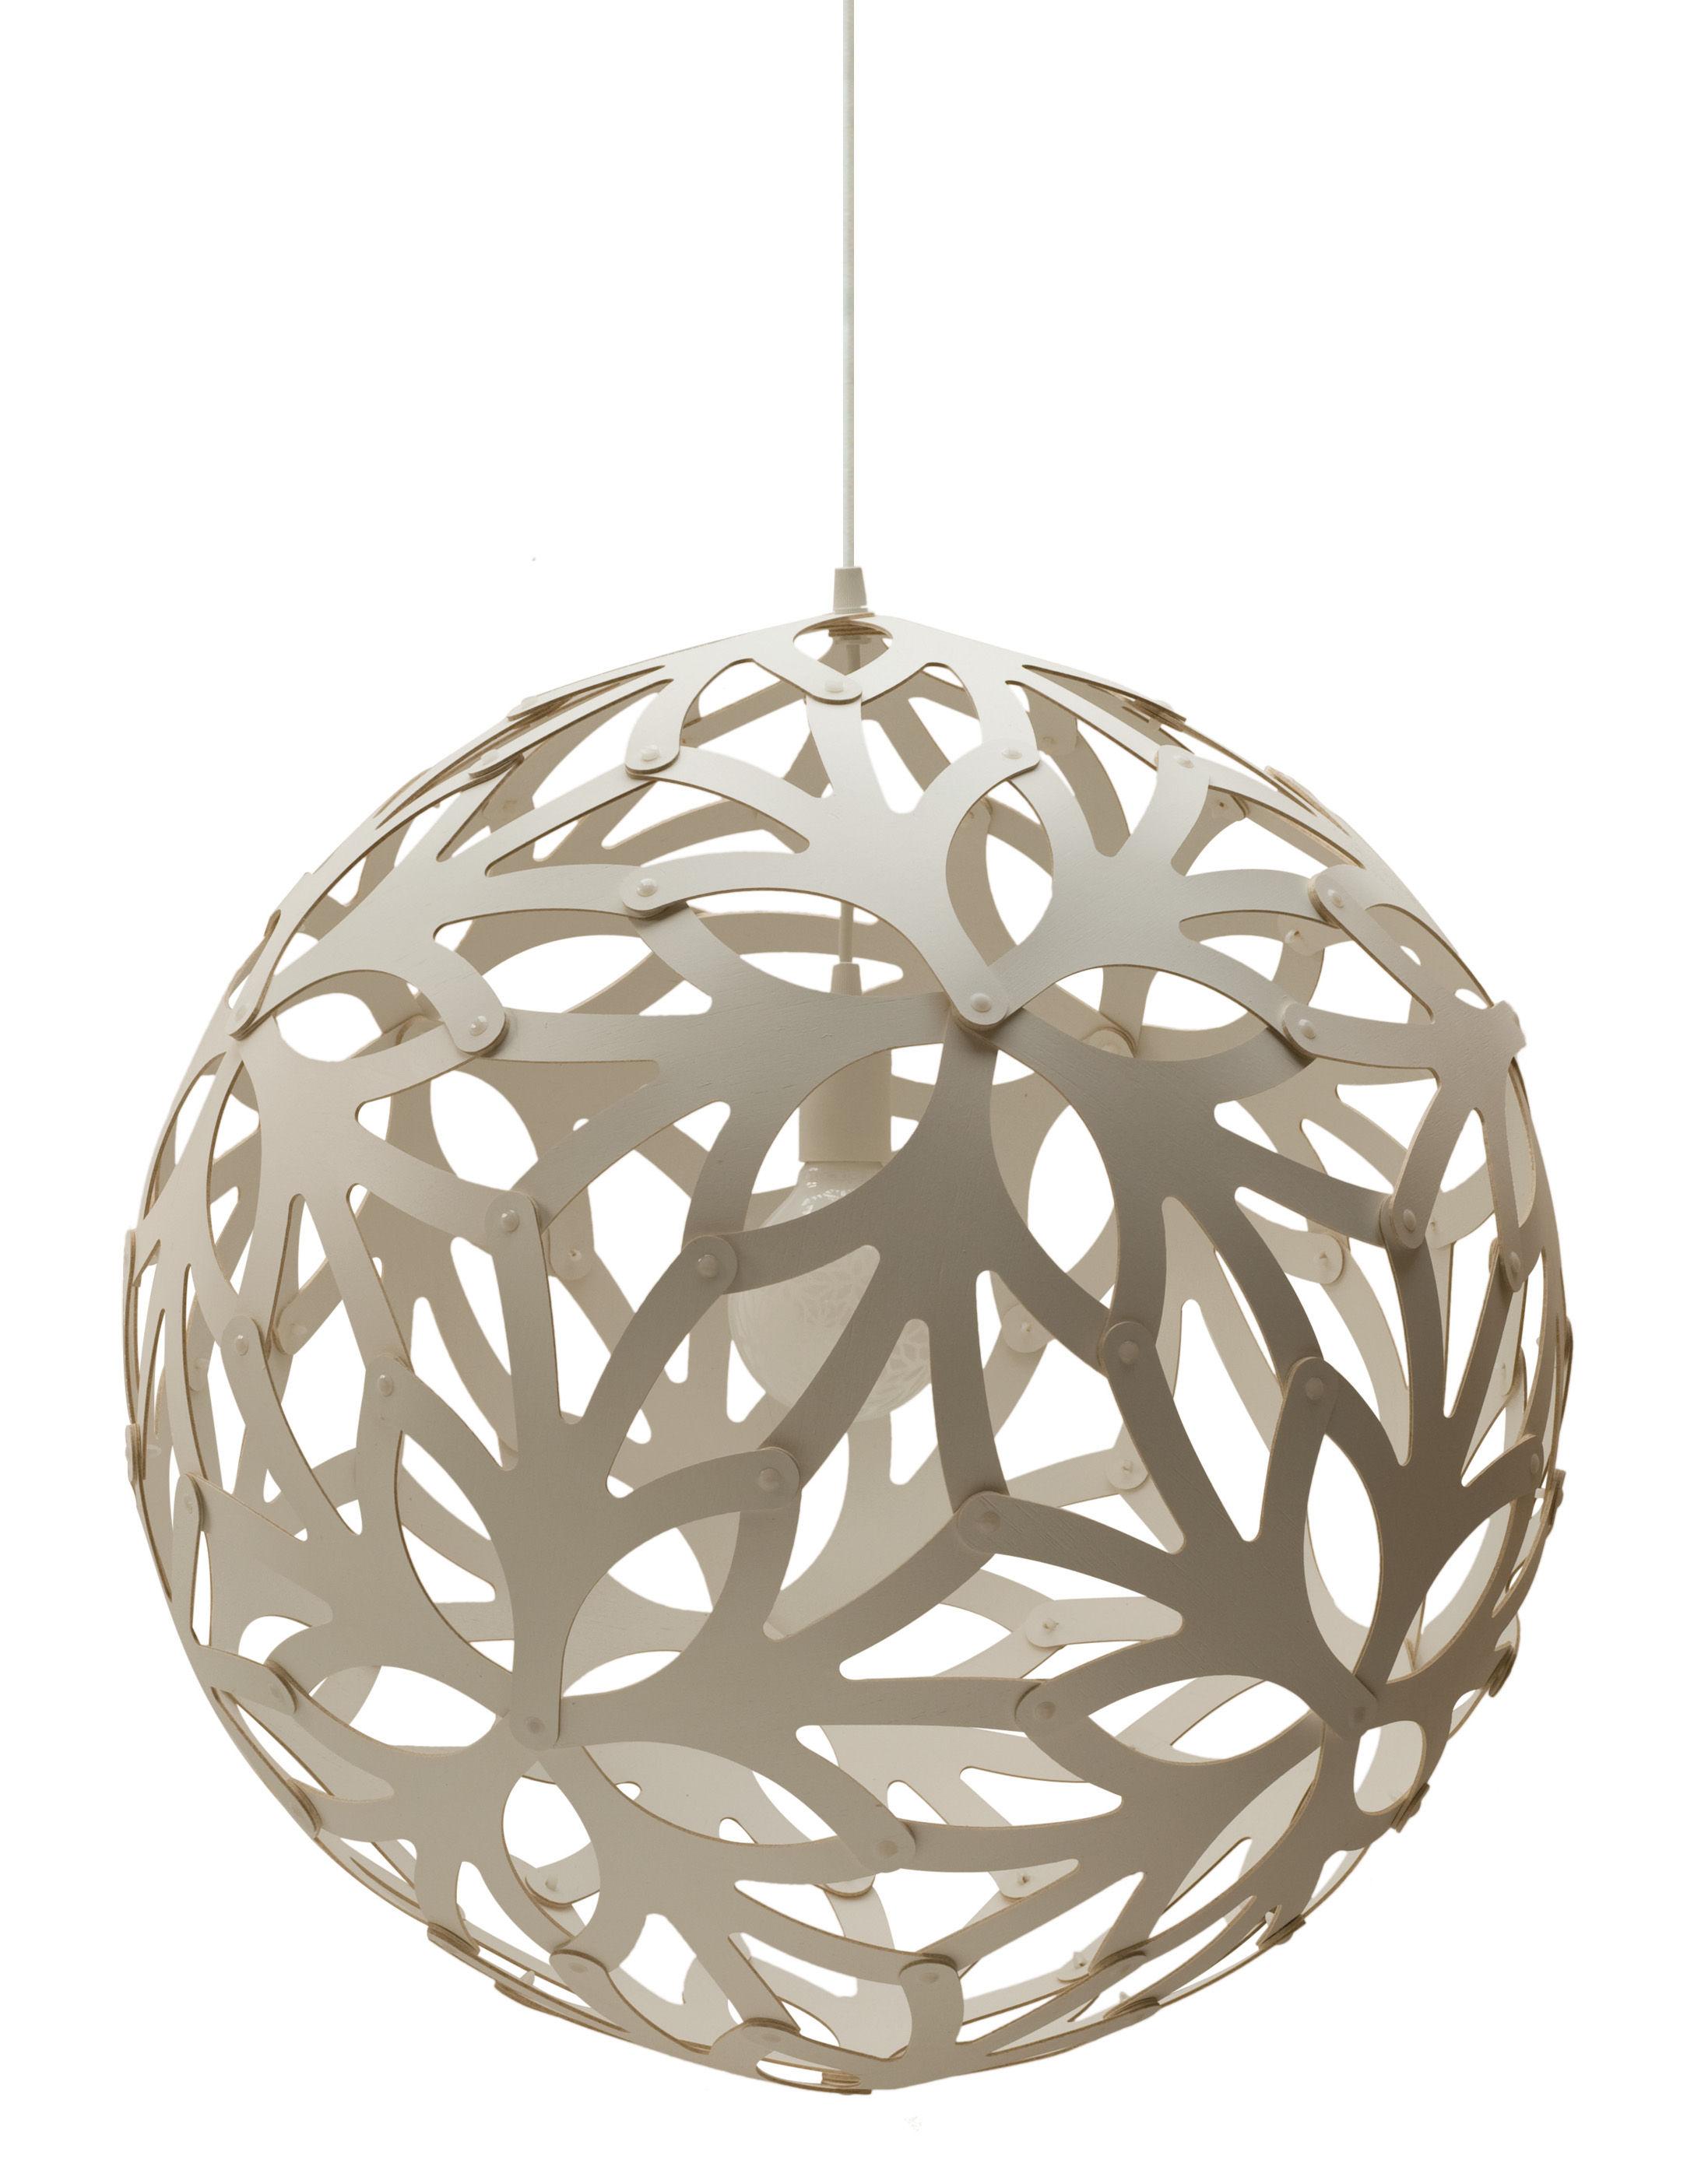 Lighting - Pendant Lighting - Floral Pendant - Ø 40 cm by David Trubridge - White - Pine